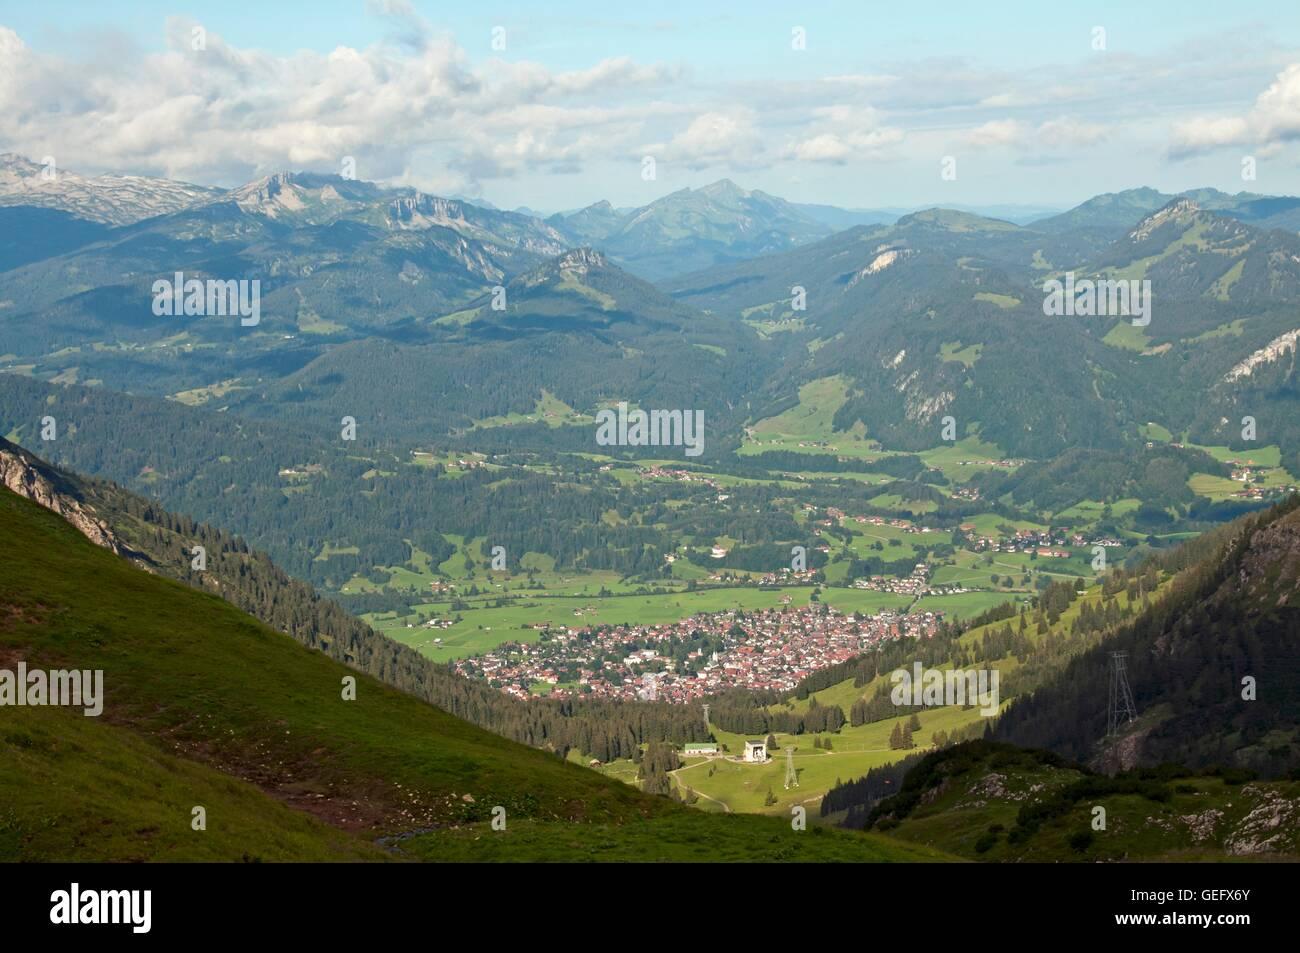 Nebelhorn Cableway with station Seealpe, Oberstdorf, Allgaeu, Bavaria - Stock Image